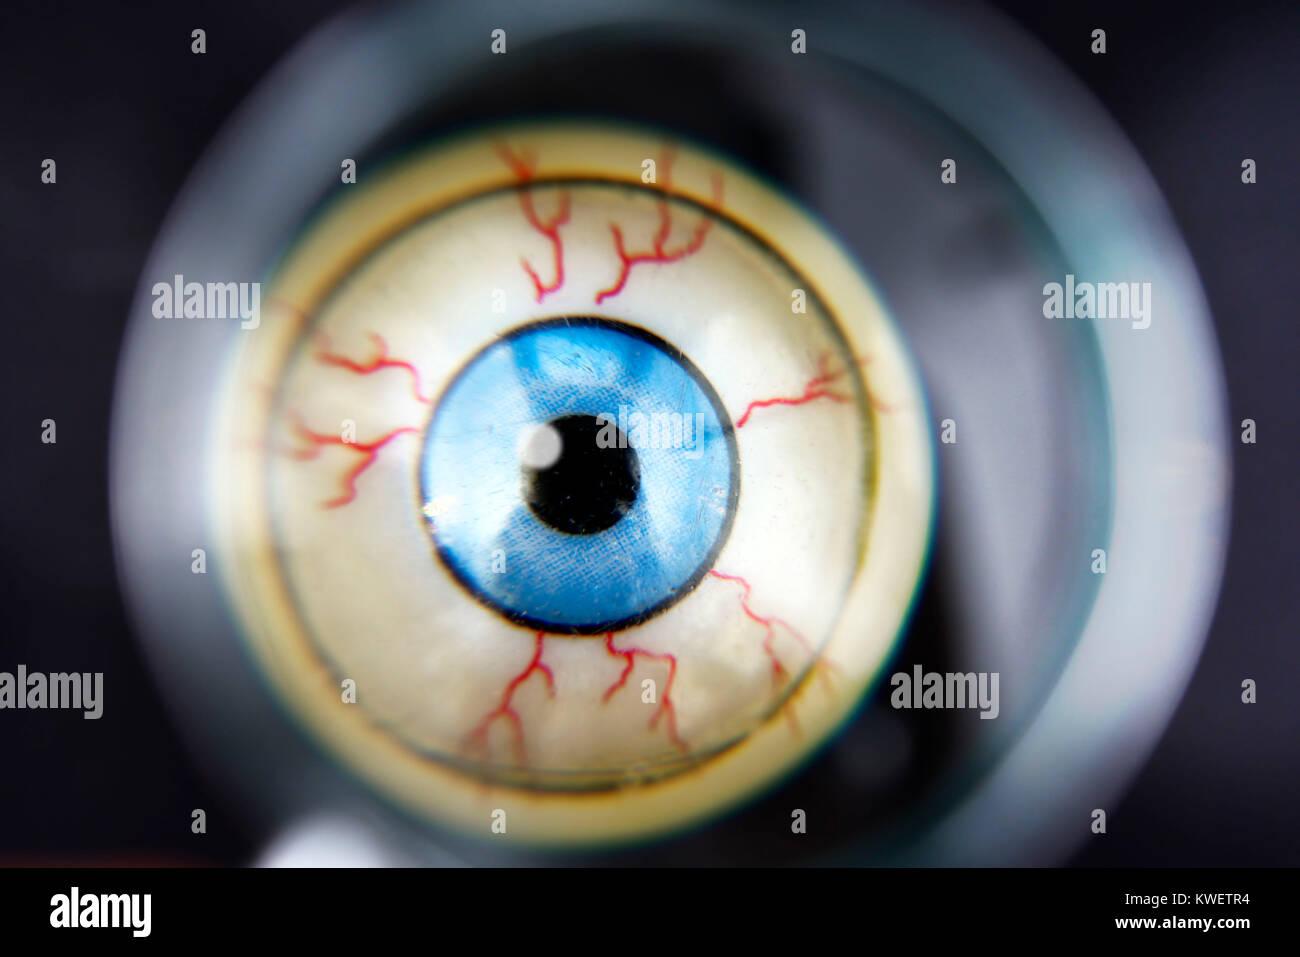 Eye under the magnifying glass, symbolic photo Federal Intelligence Service scandal, Auge unter der Lupe, Symbolfoto - Stock Image